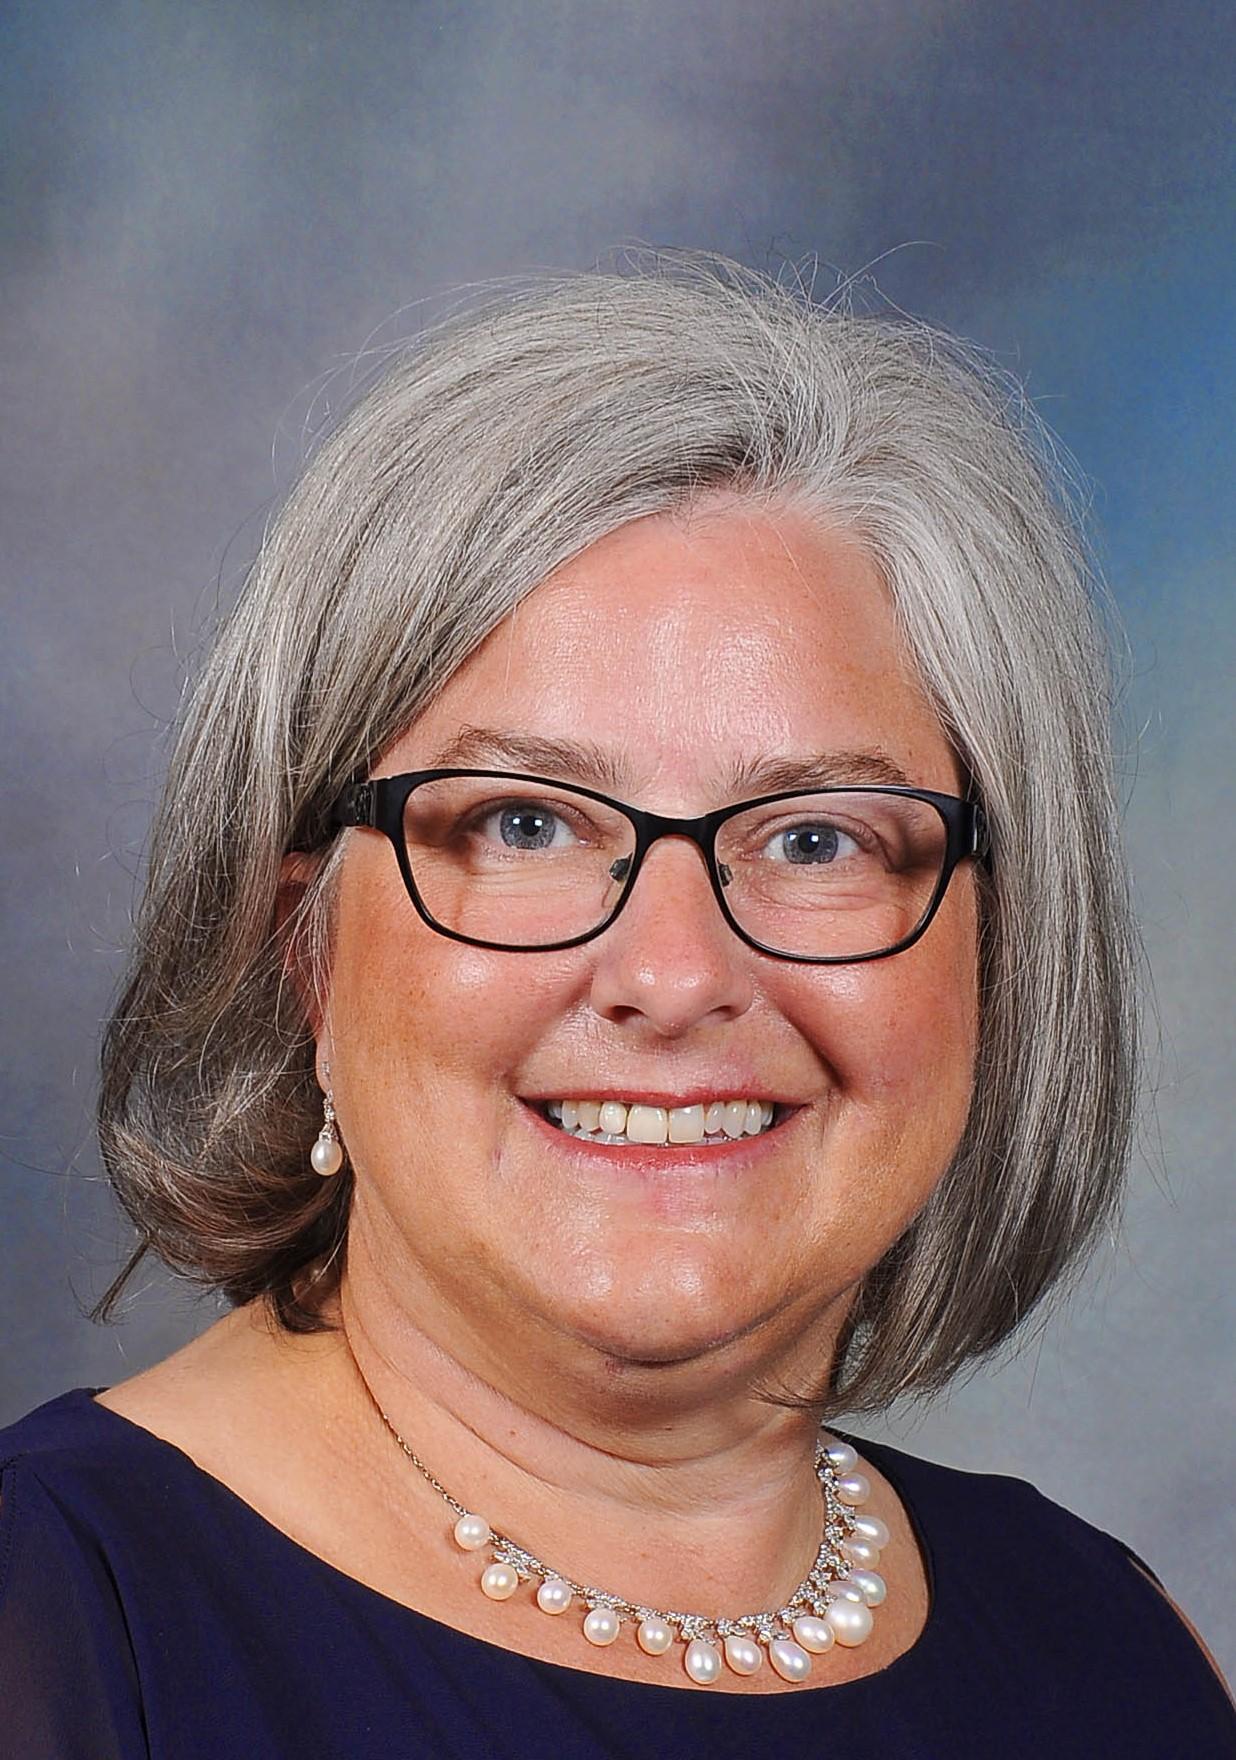 Dr. Dawn Stacey